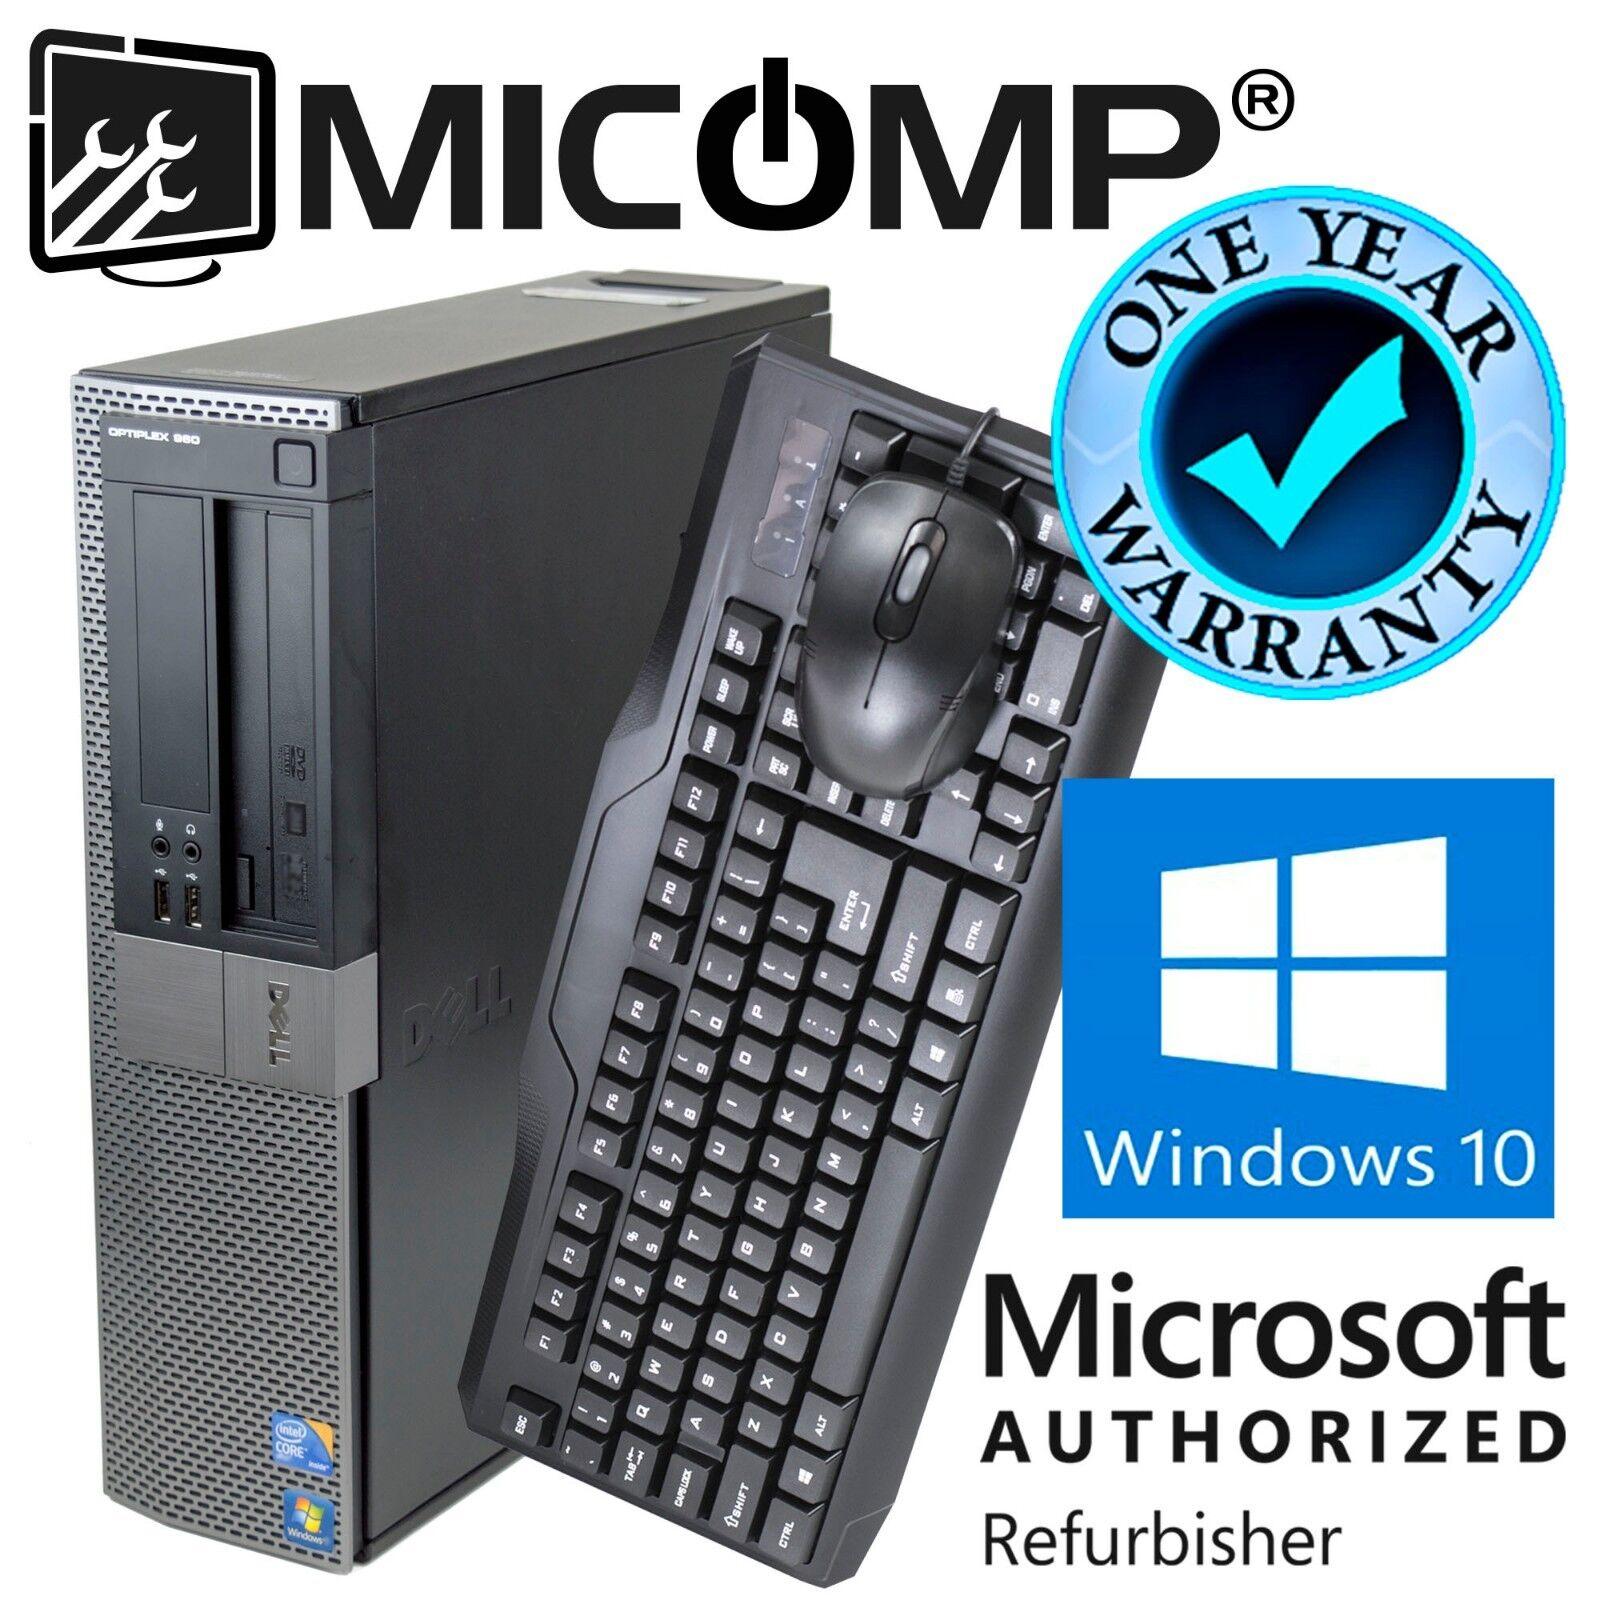 dell-optiplex-desktop-computer-pc-quad-core-i5-cpu-3-10ghz-dvd-rom-windows-10-64